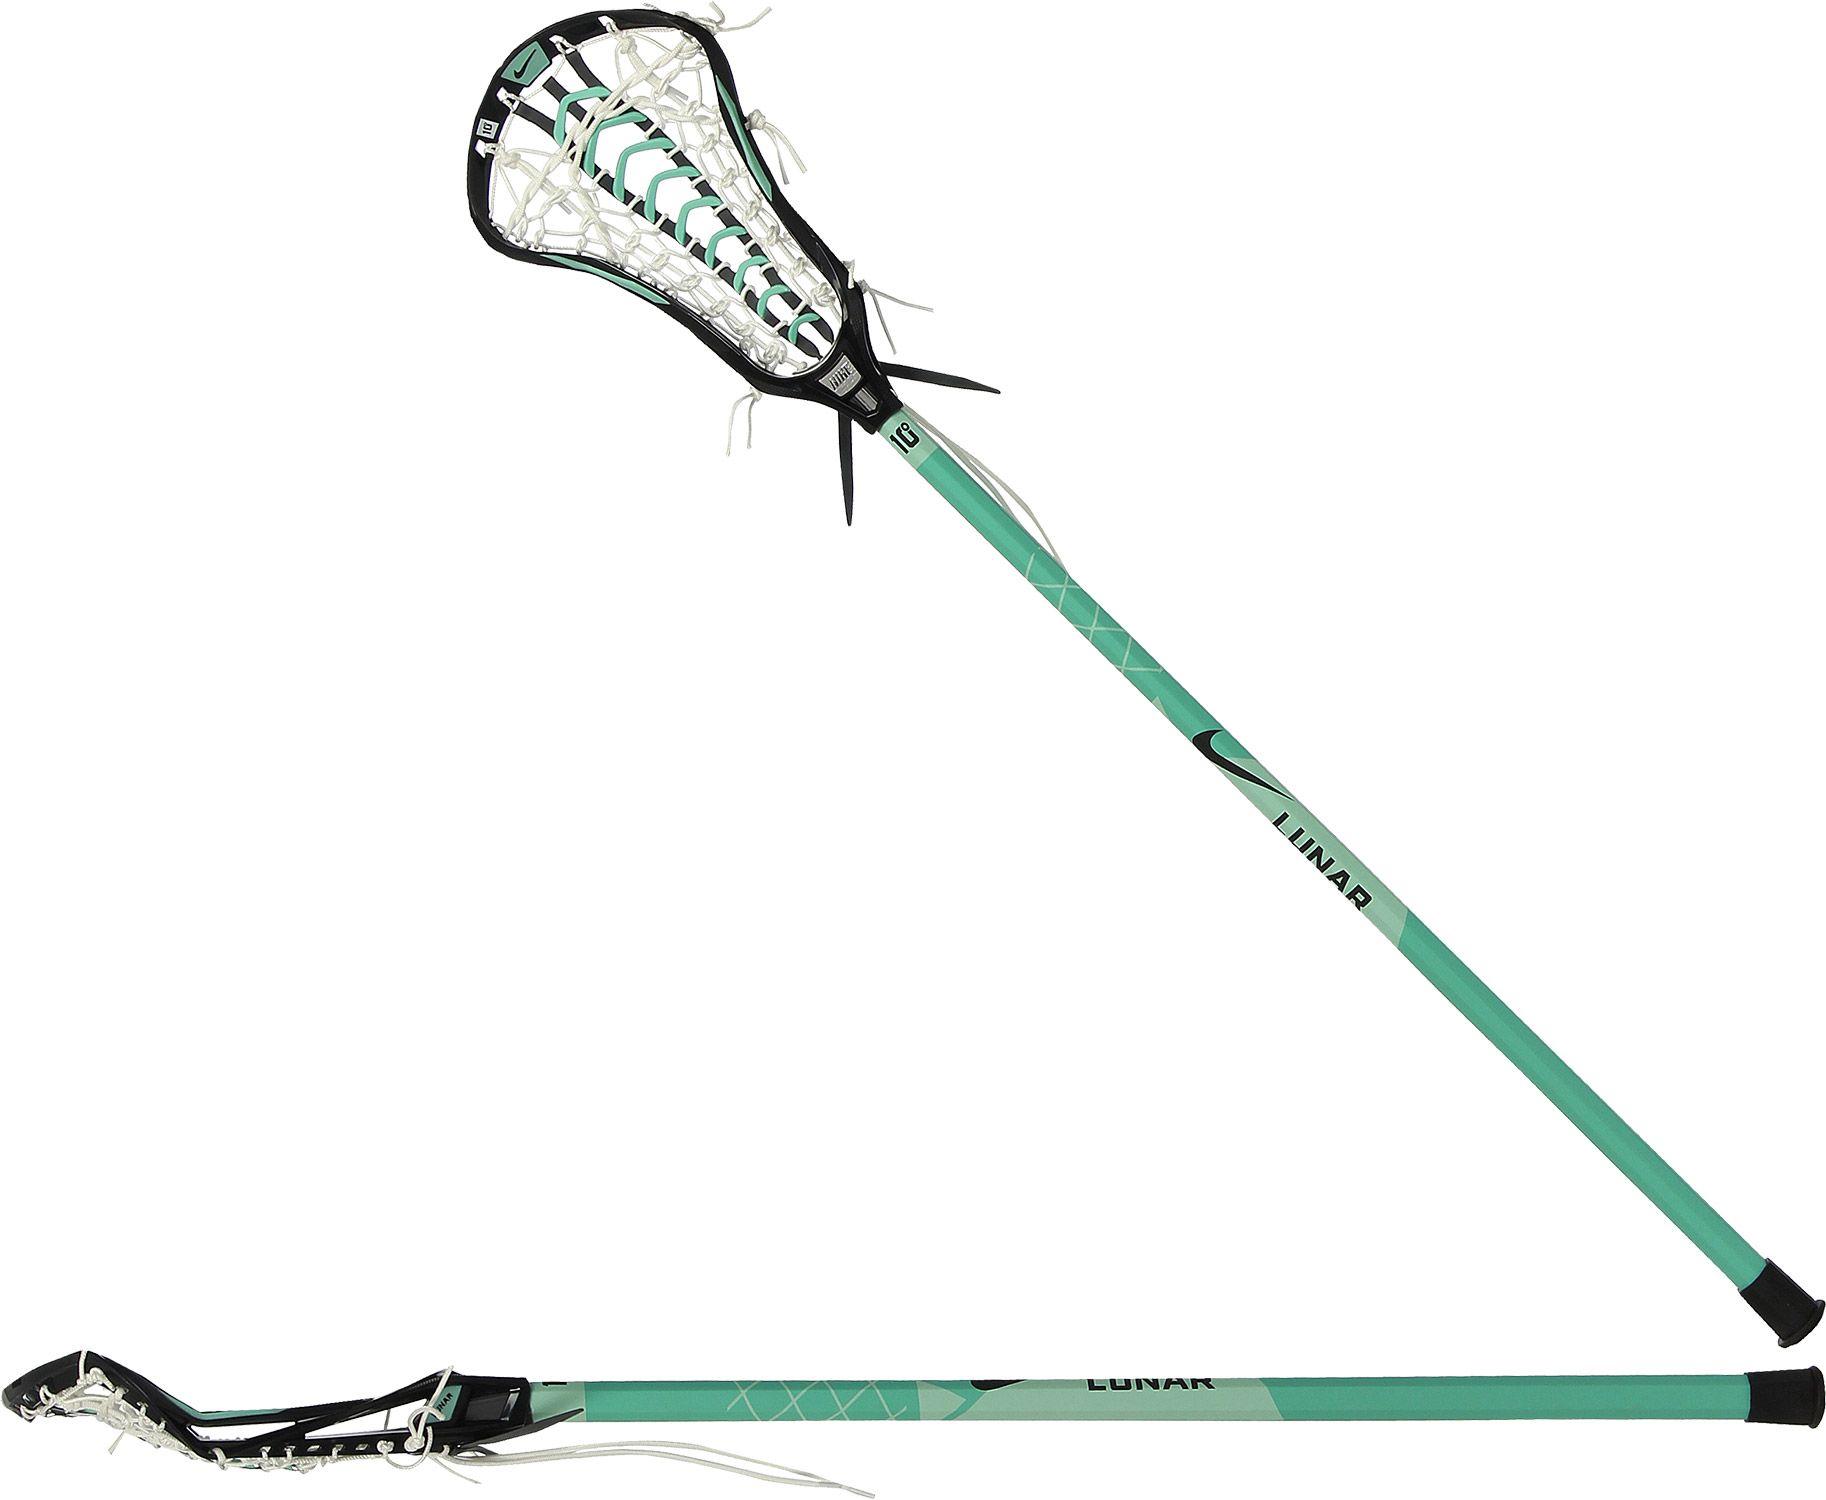 huge selection of 2c356 474e7 ... best price nike womens lunar elite on lunar 10 lacrosse stick ad7f8  e8f52